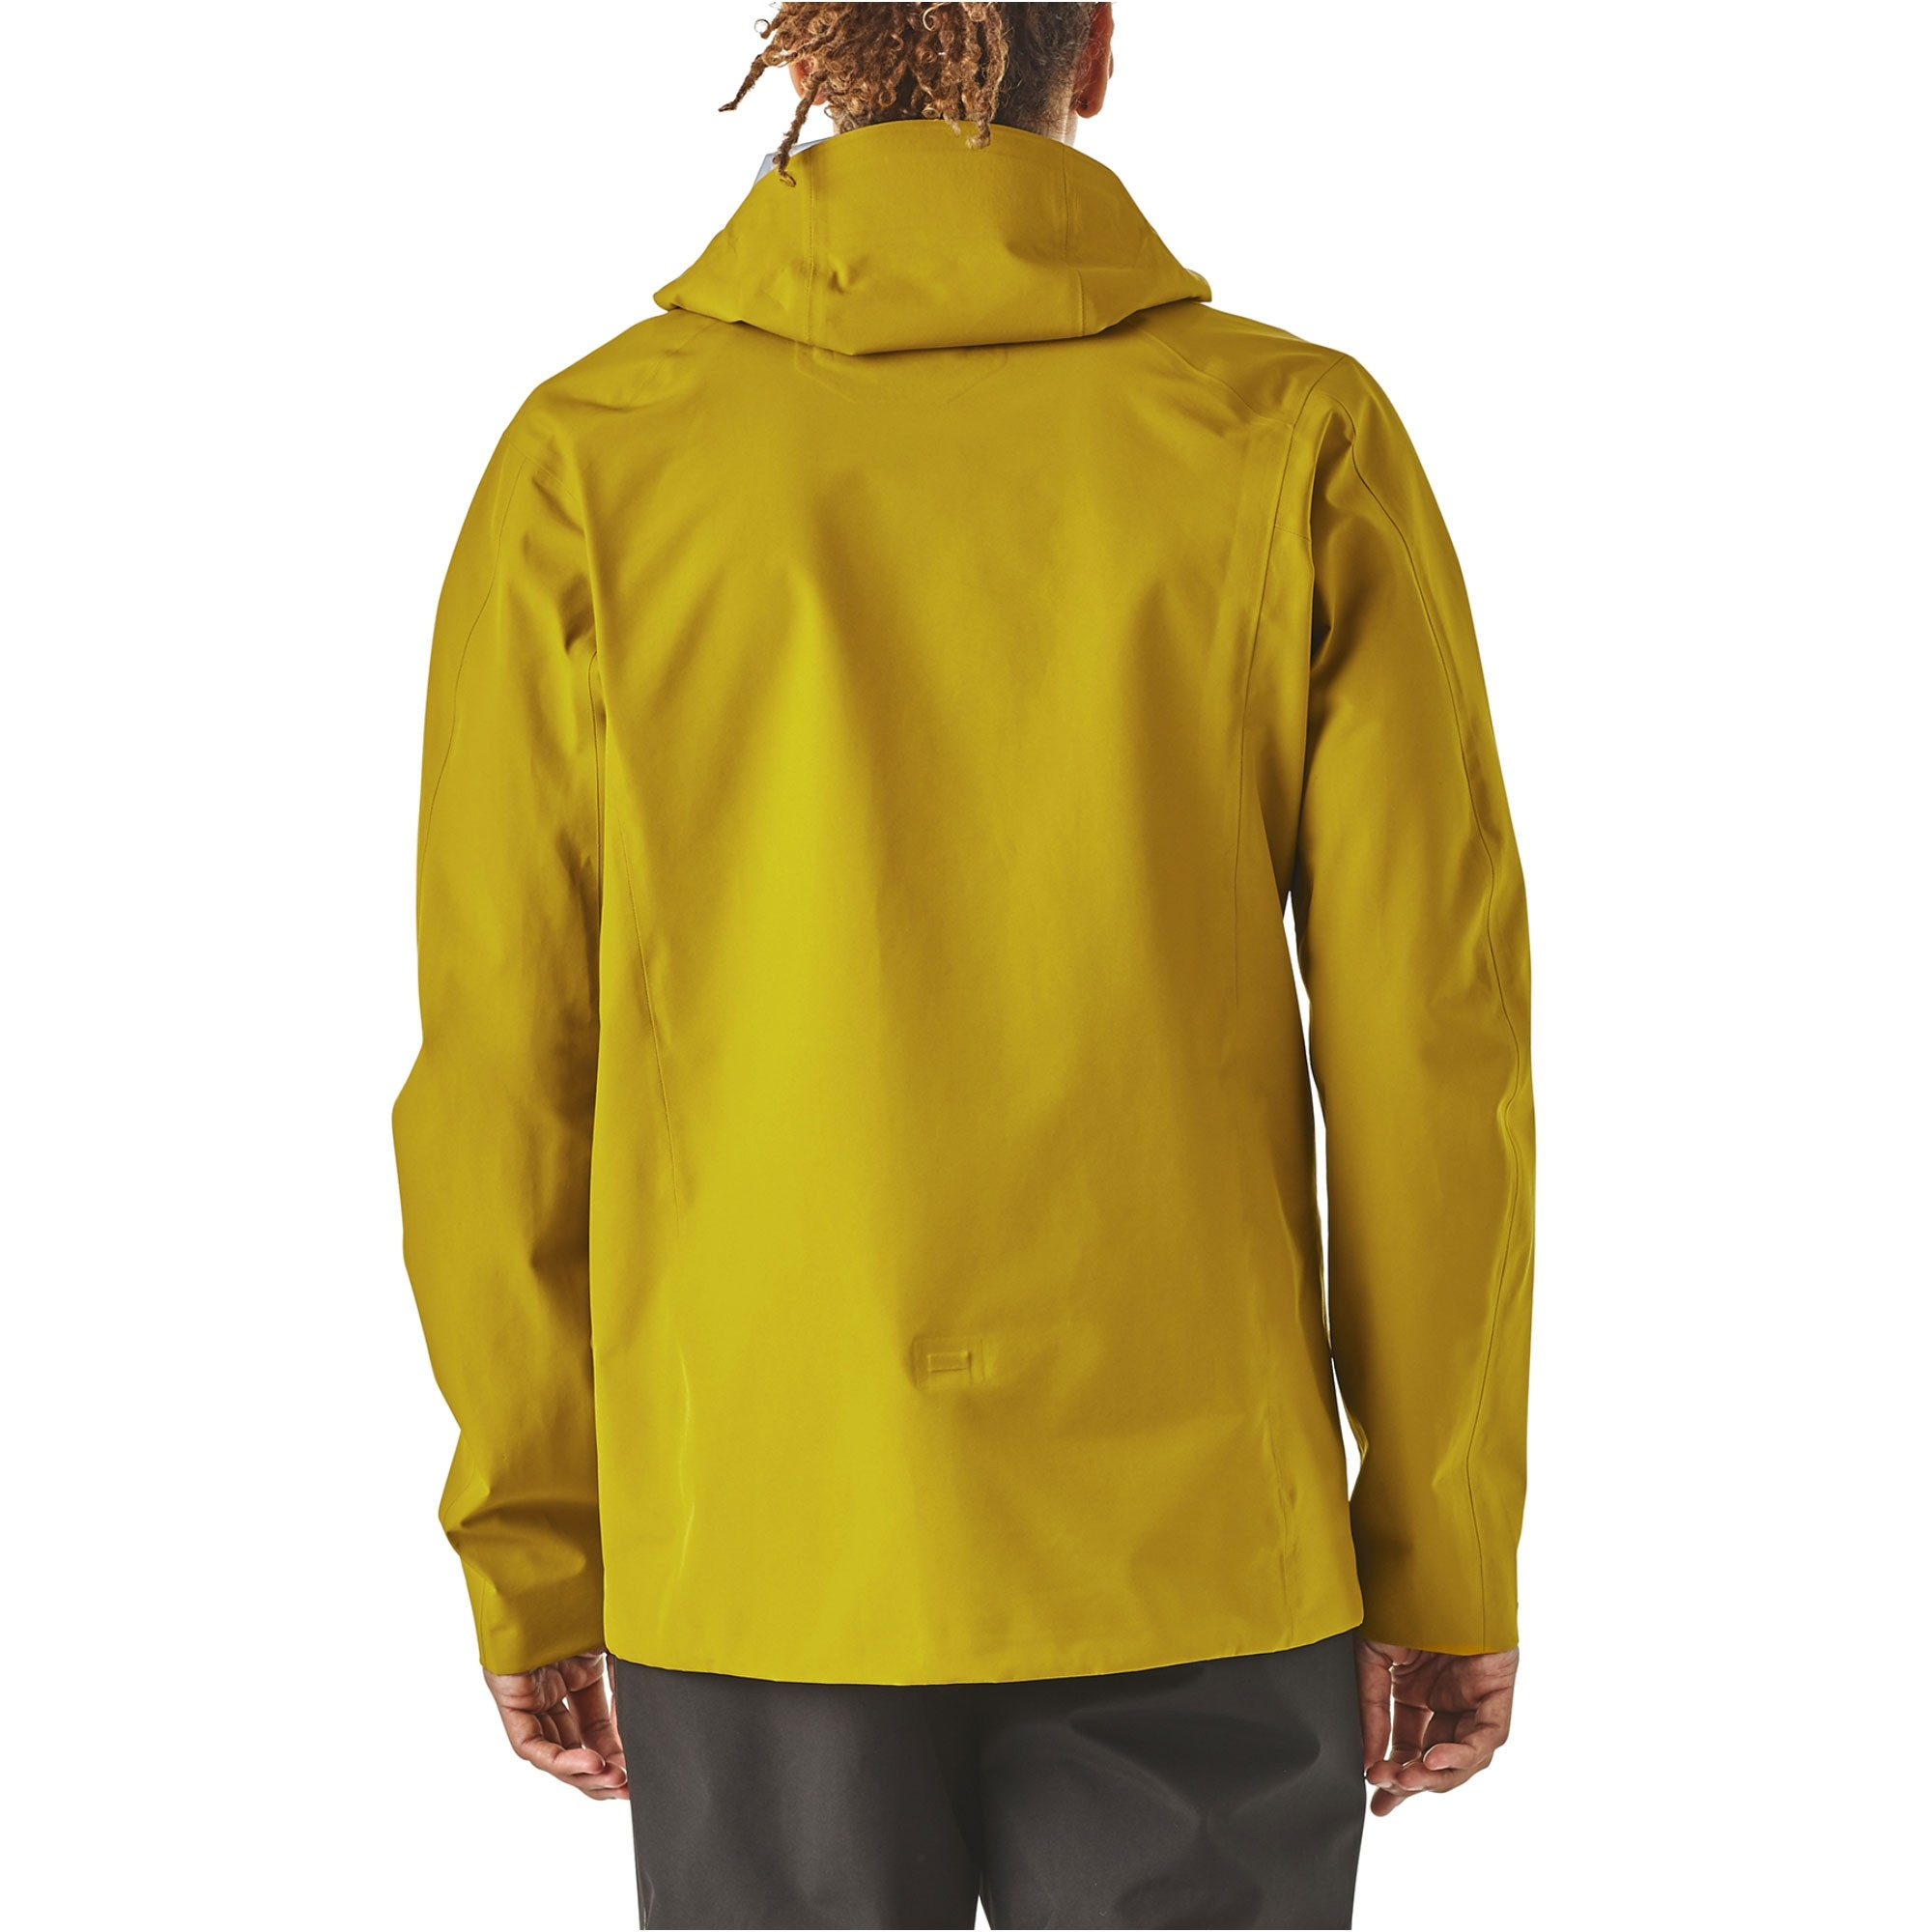 Patagonia Triolet Men's GTX Jacket - Textile Green